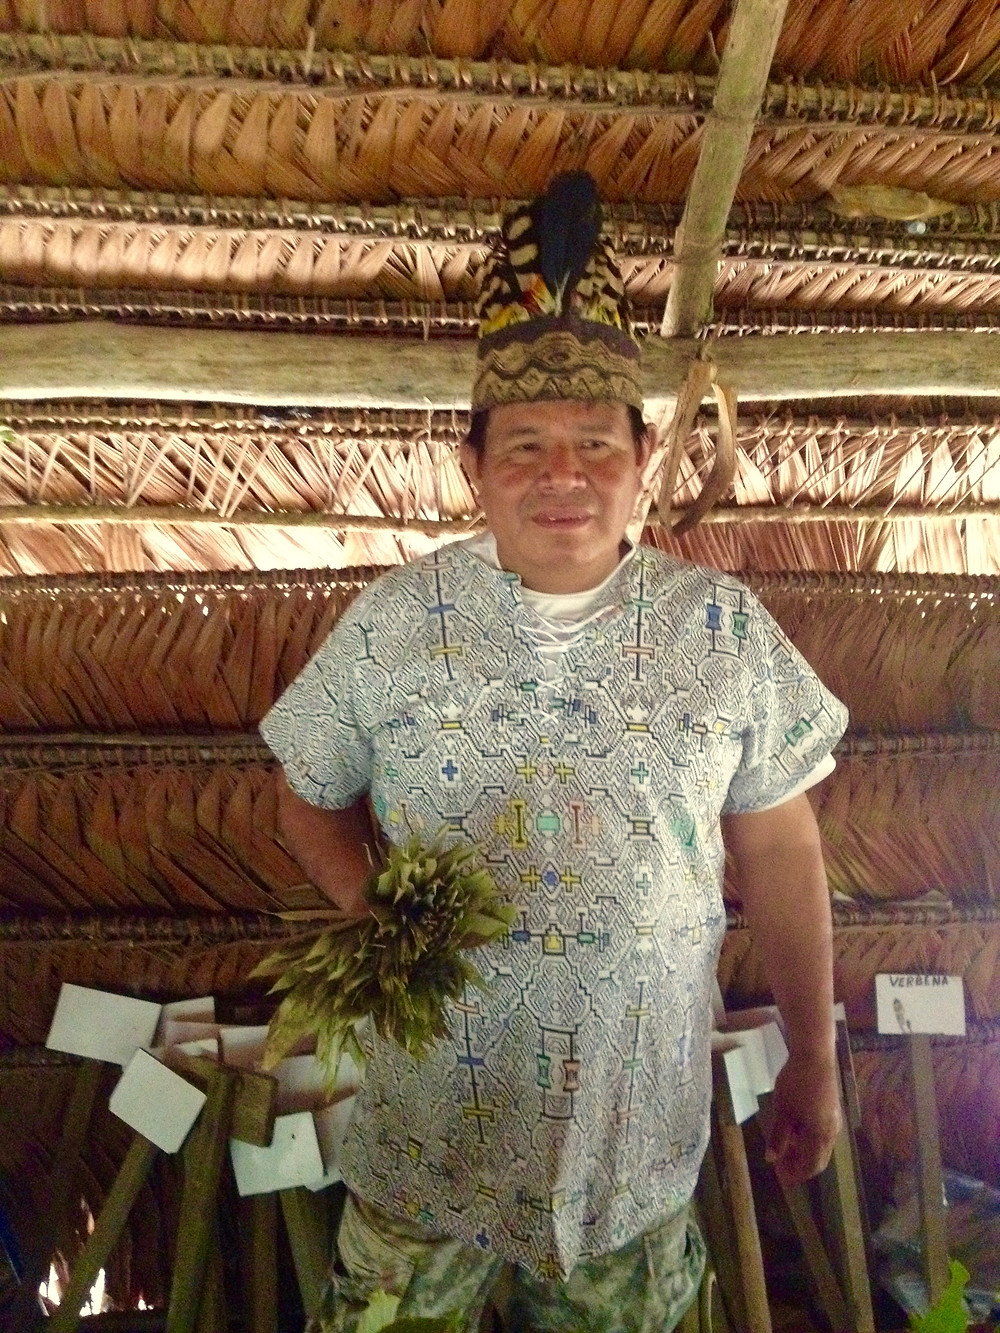 Shaman--Amazonian Rainforest